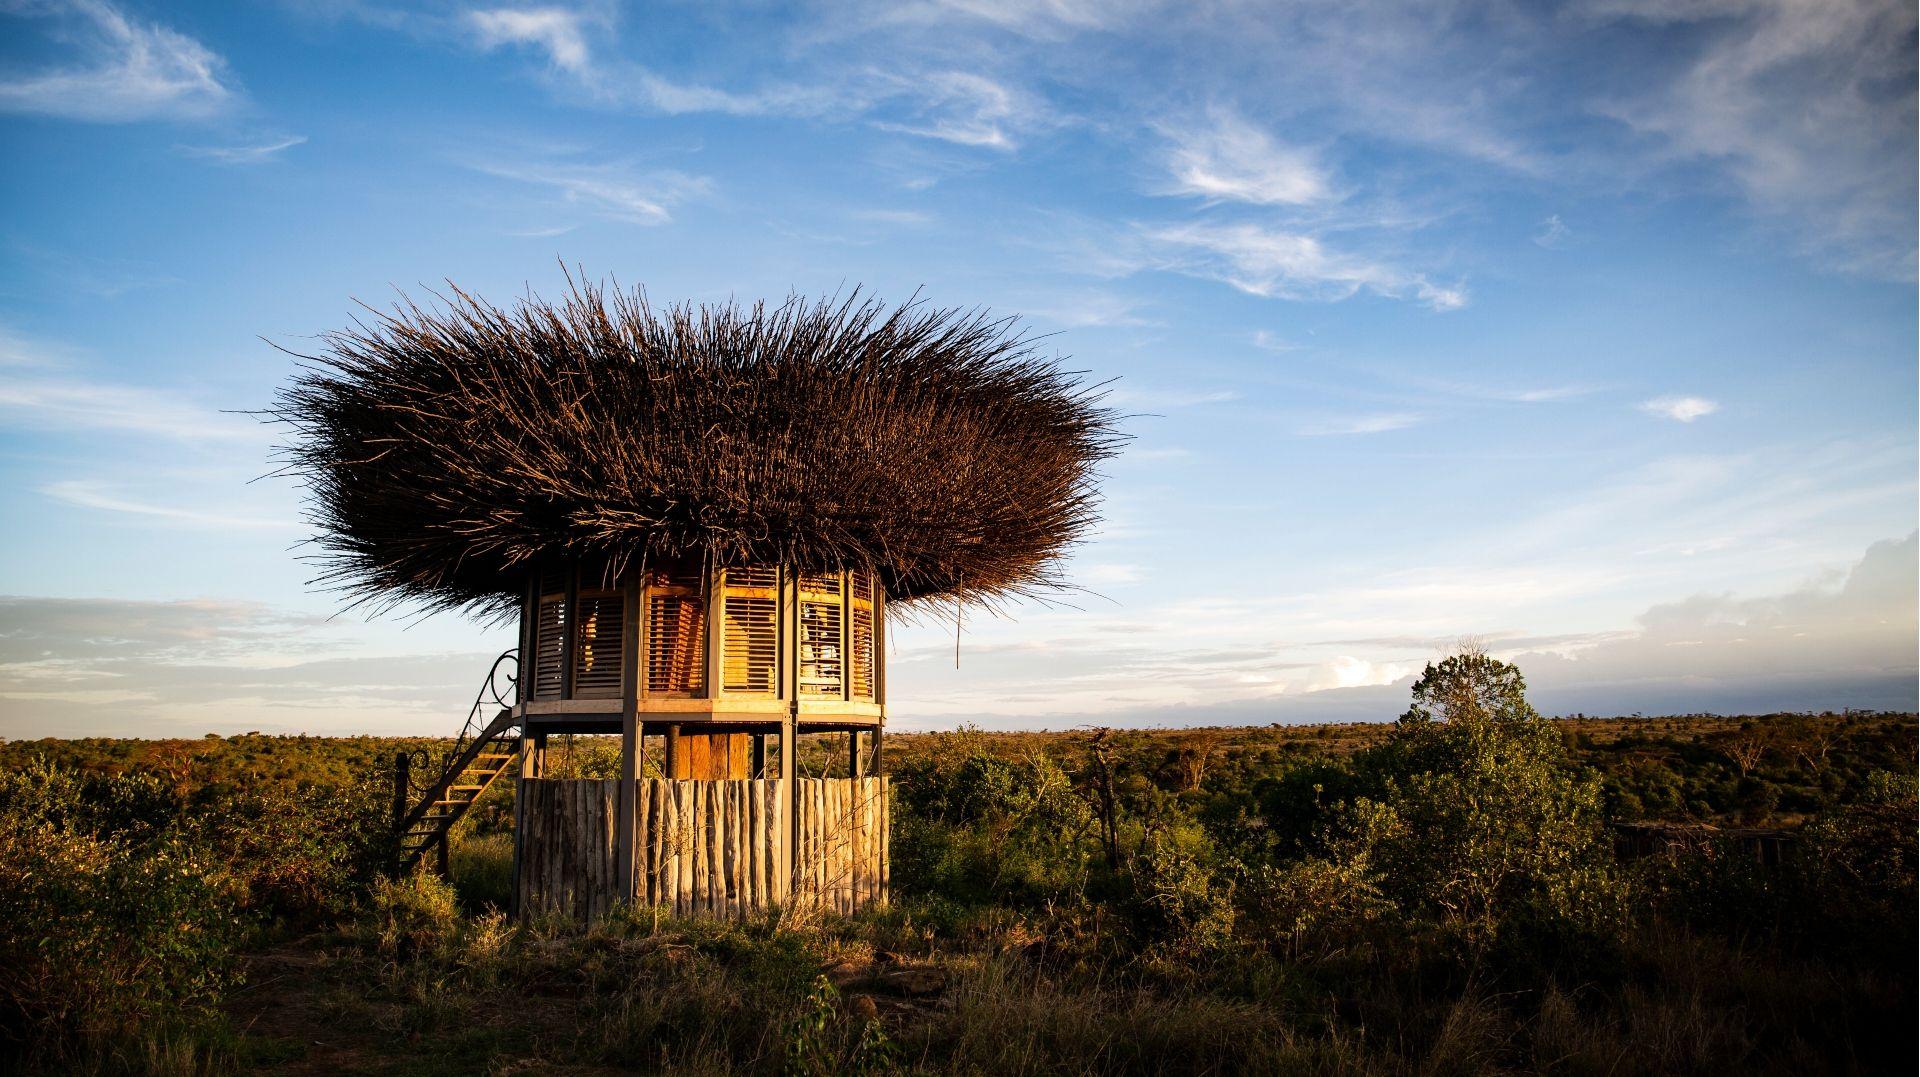 Nay Palad Bird's nest